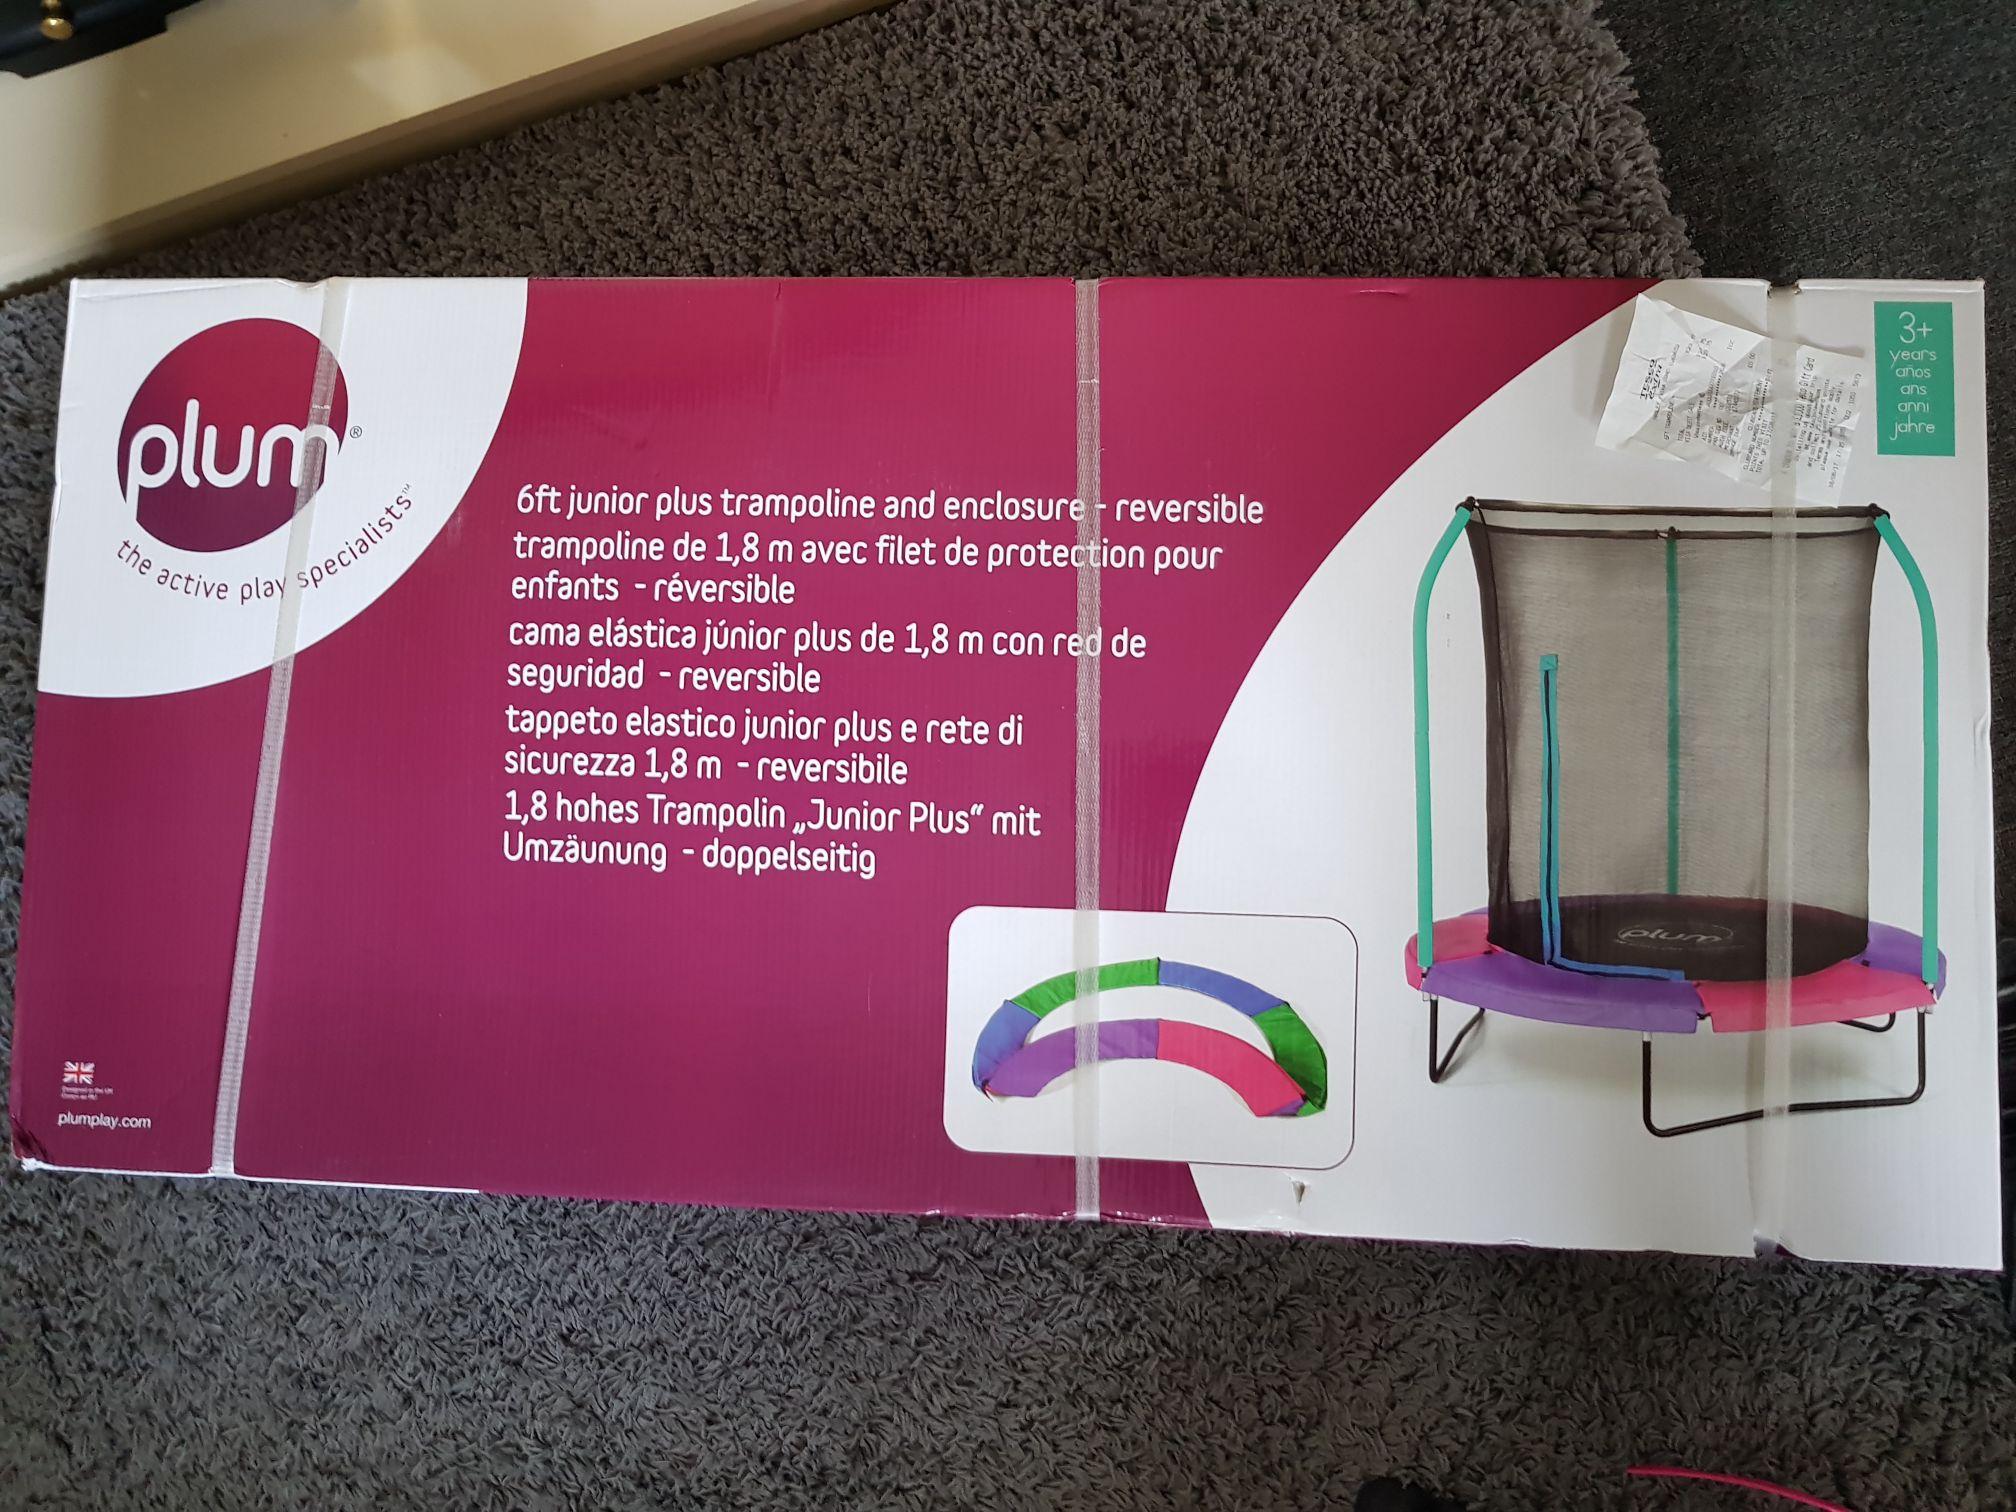 Plum 6ft Trampoline & enclosure - £23.75 instore at Tesco Hanley